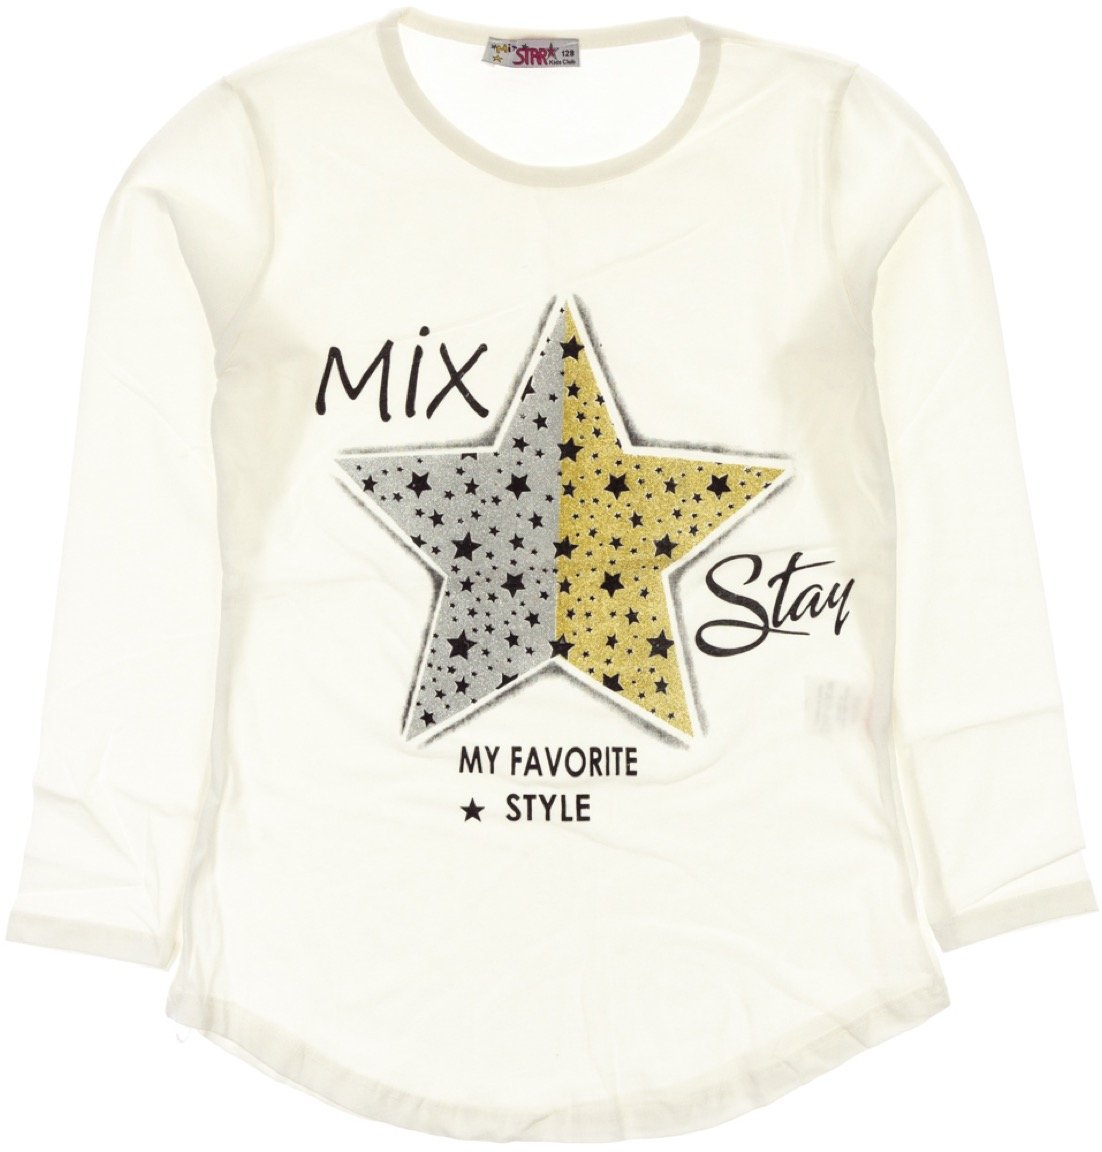 Mix Star παιδική εποχιακή μπλούζα «My Favorite Style»